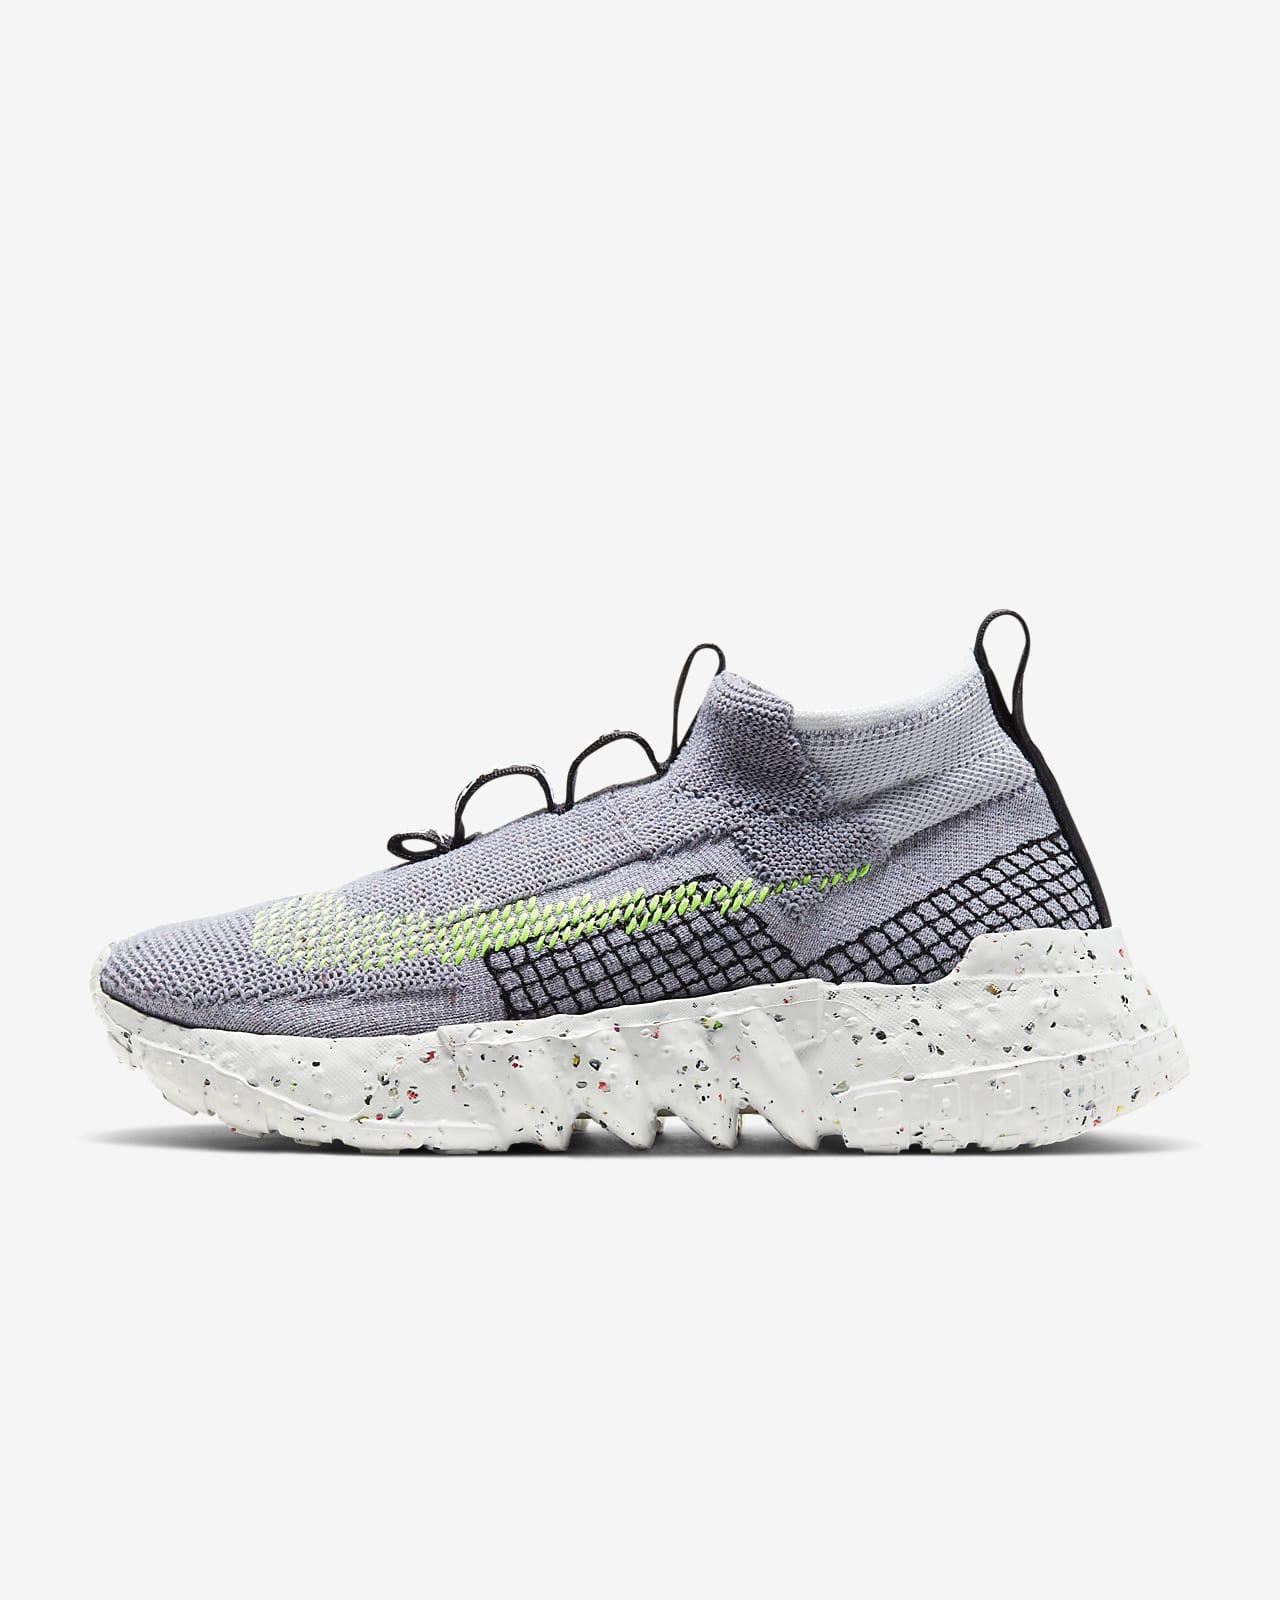 Nike Space Hippie 02 Shoe